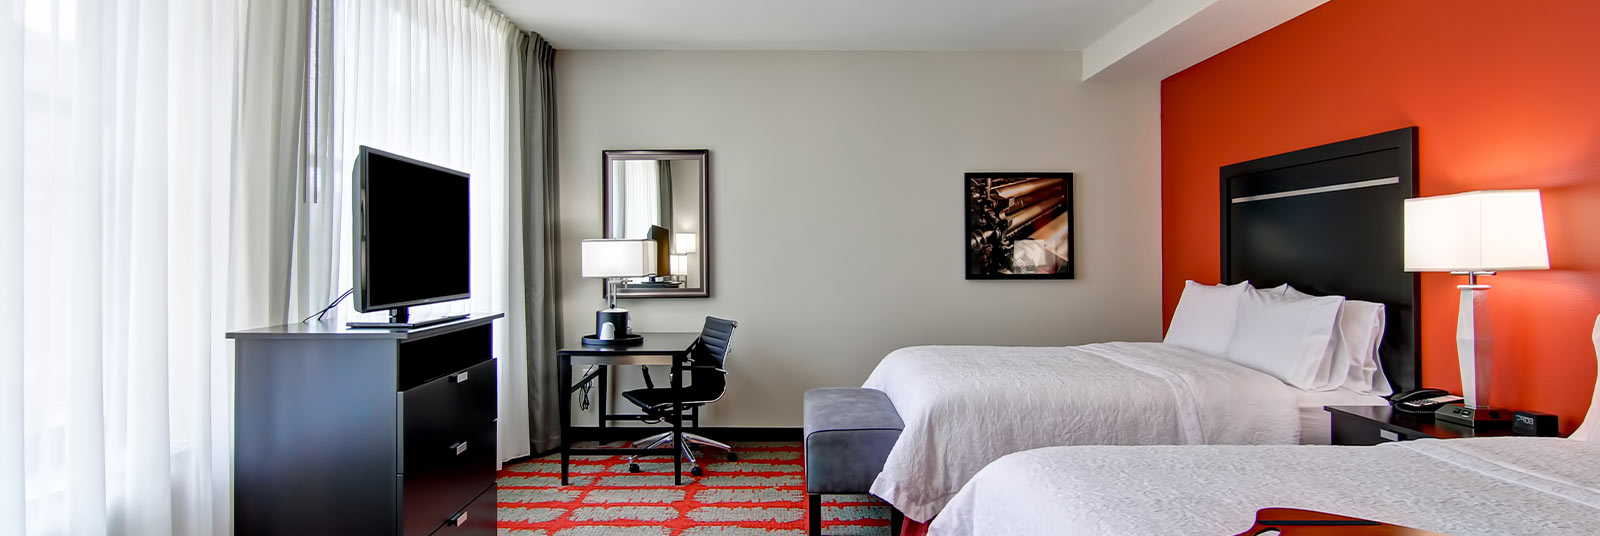 Guest room at the Hampton Inn in downtown Cincinnati, Ohio.